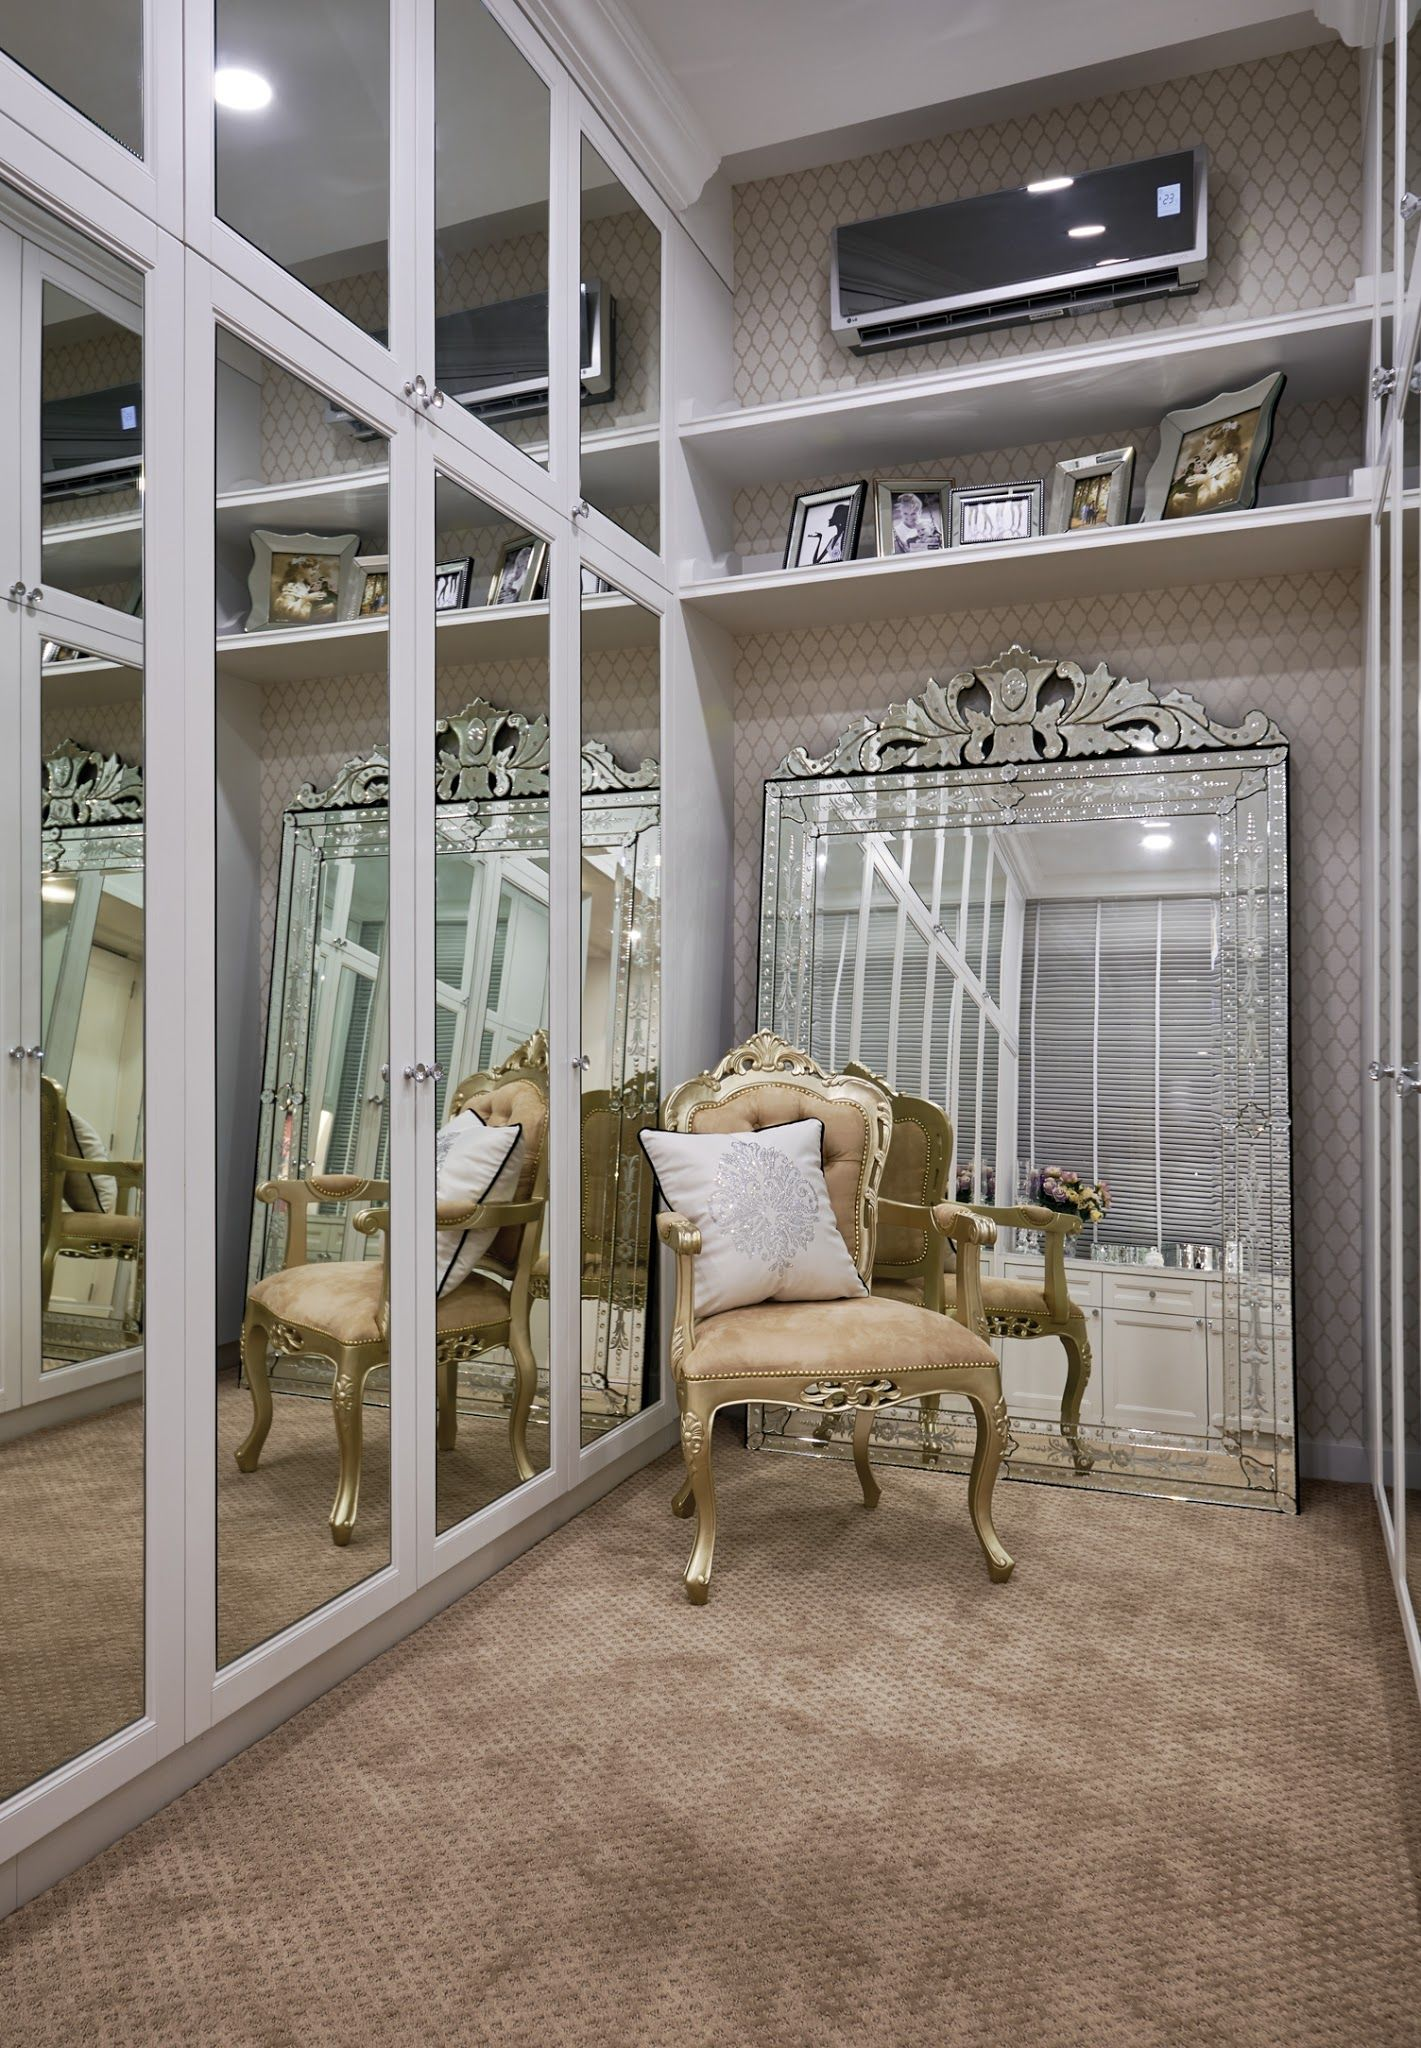 The view serai saujana pj home studio house also interior decor furniture rh pinterest